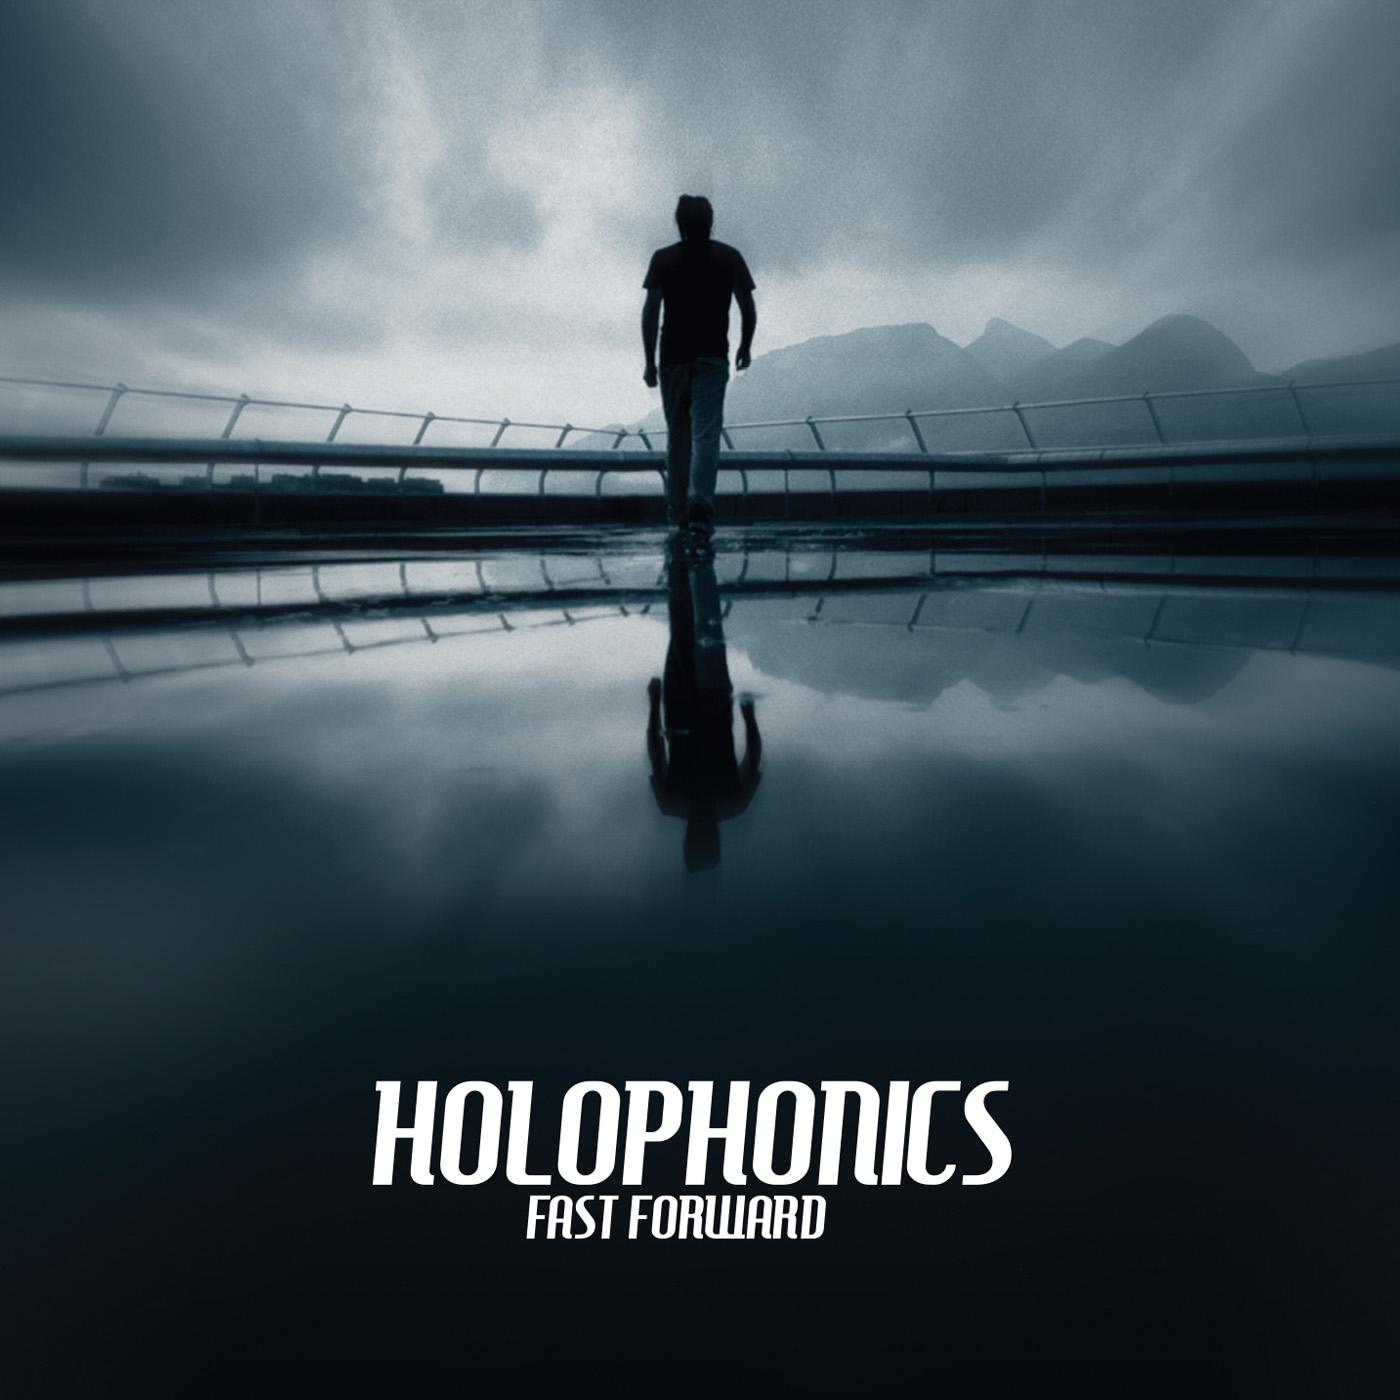 Holophonics artwork